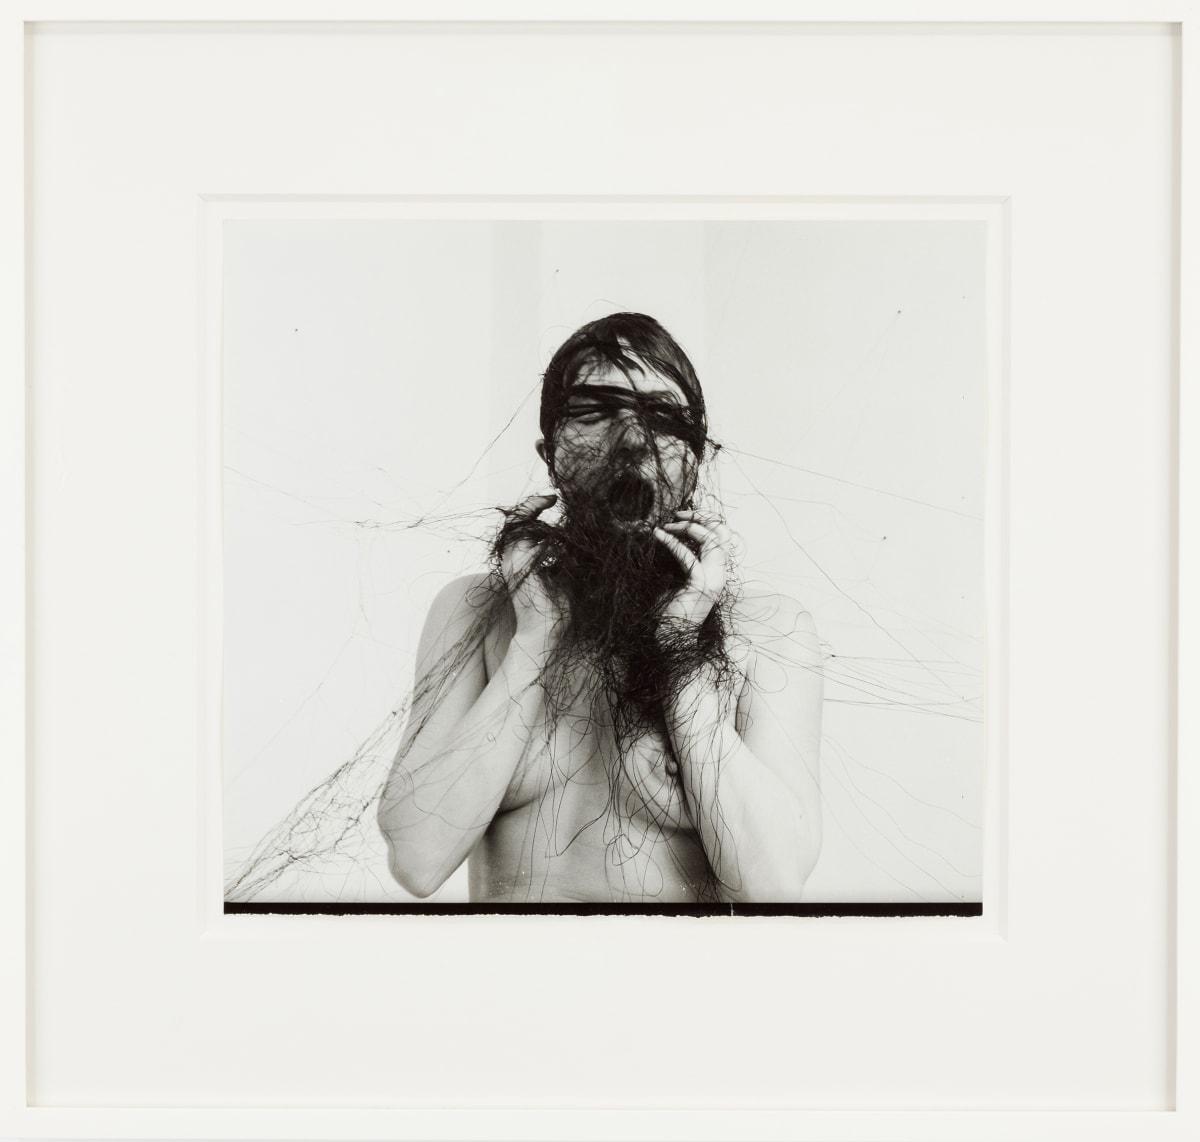 Annegret SOLTAU Permanent demonstration am 19.1.1976, 1976 Gelatin silver print 27.5 x 31 cm